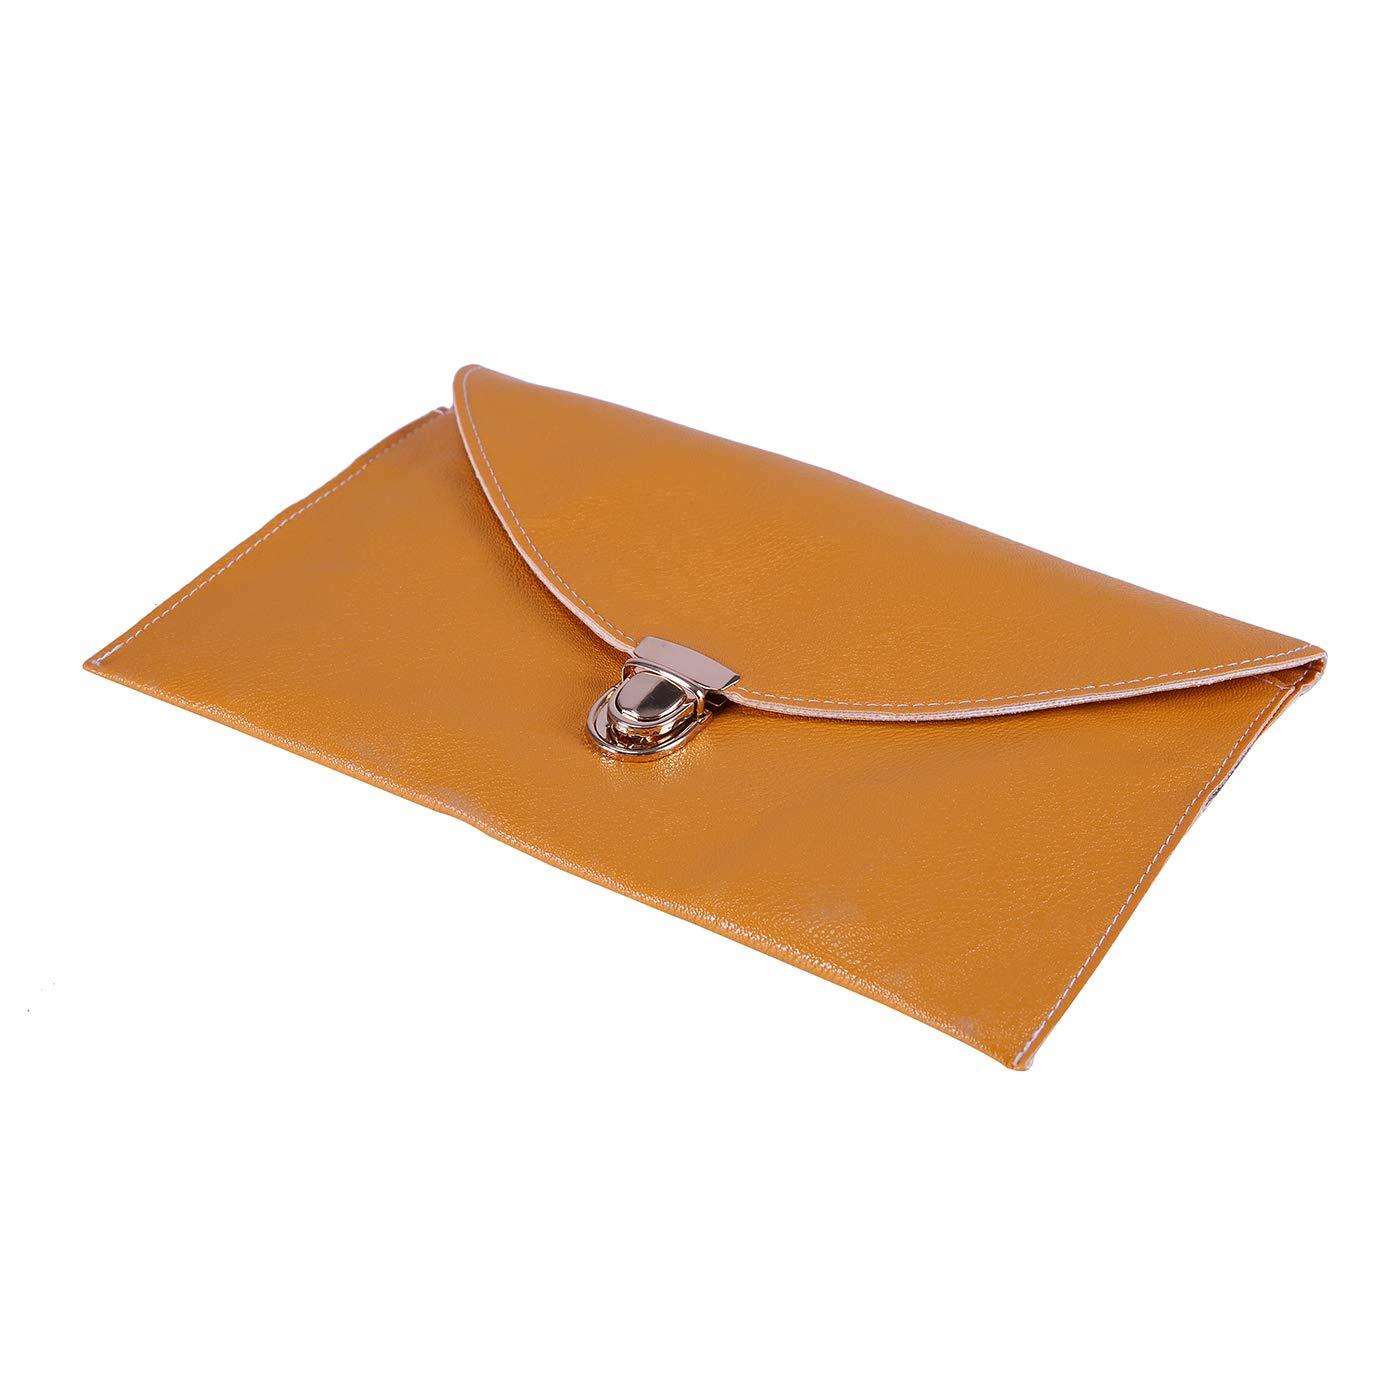 HDE Women's Fashion Cross Body Gold Buckle Purse Vegan Leather Envelope Handbag by HDE (Image #4)